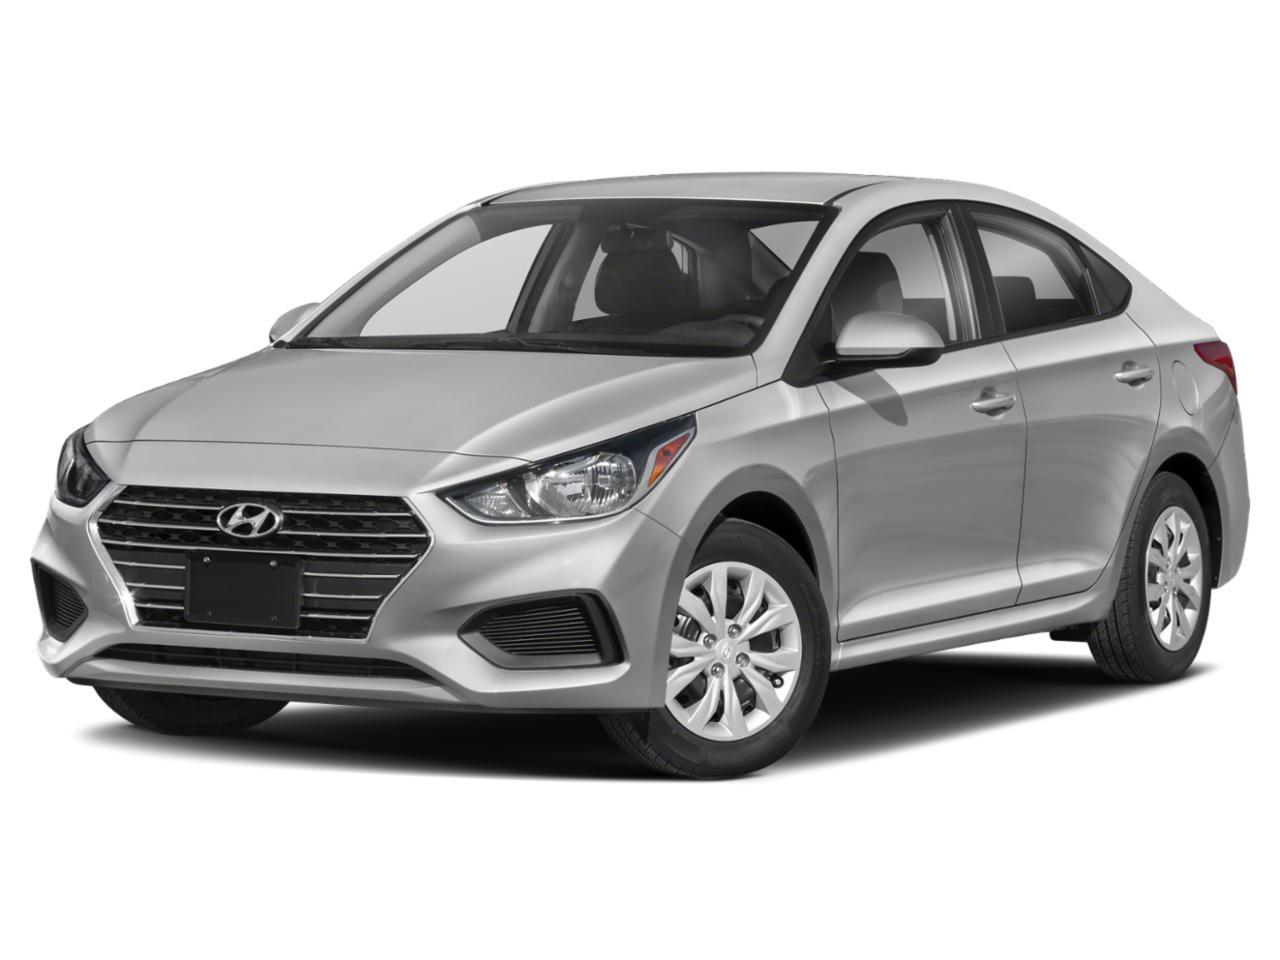 2021 Hyundai Accent Vehicle Photo in Odessa, TX 79762